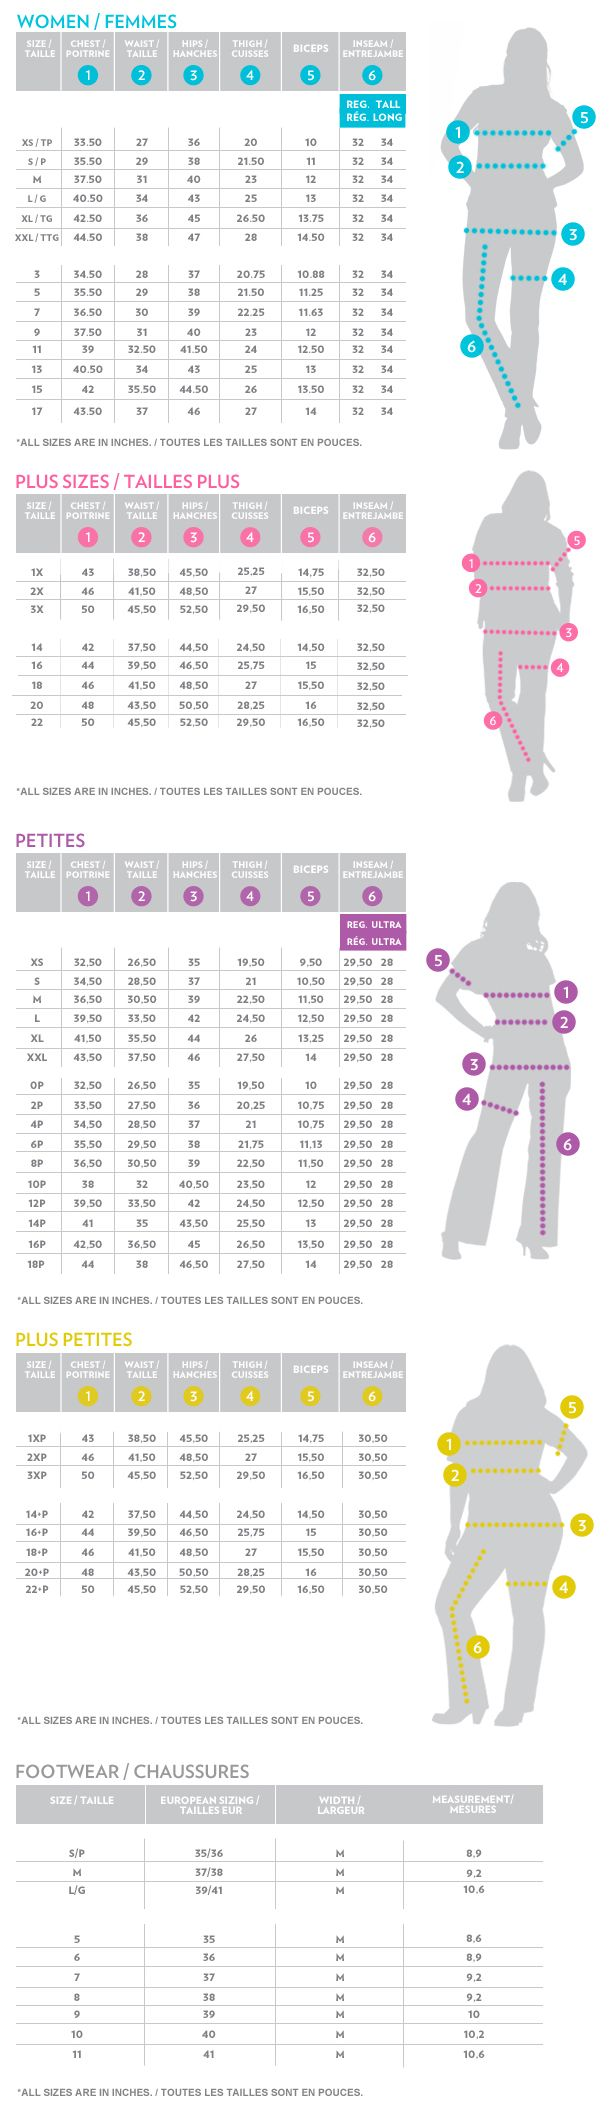 Reitmans size chart / Guide des tailles Reitmans #sizechart #tailles #reitmans